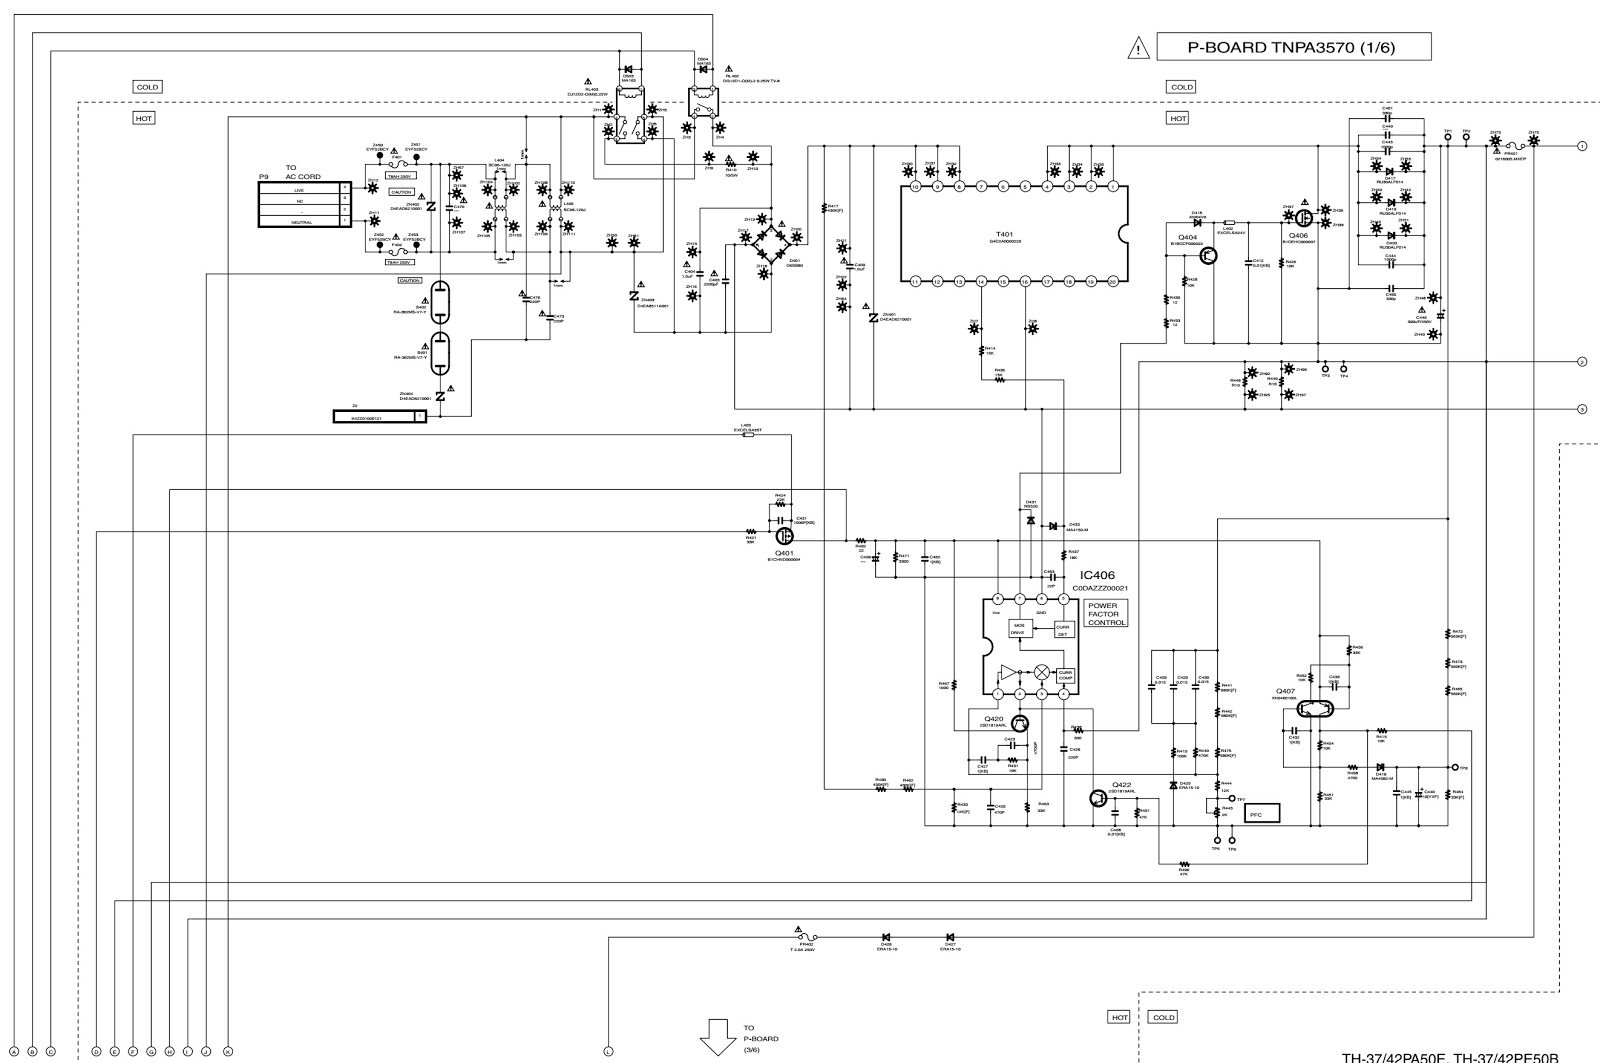 small resolution of panasonic plasma tv th42 th37 power board schematic schematic panasonic plasma tv circuit diagram panasonic plasma tv diagram